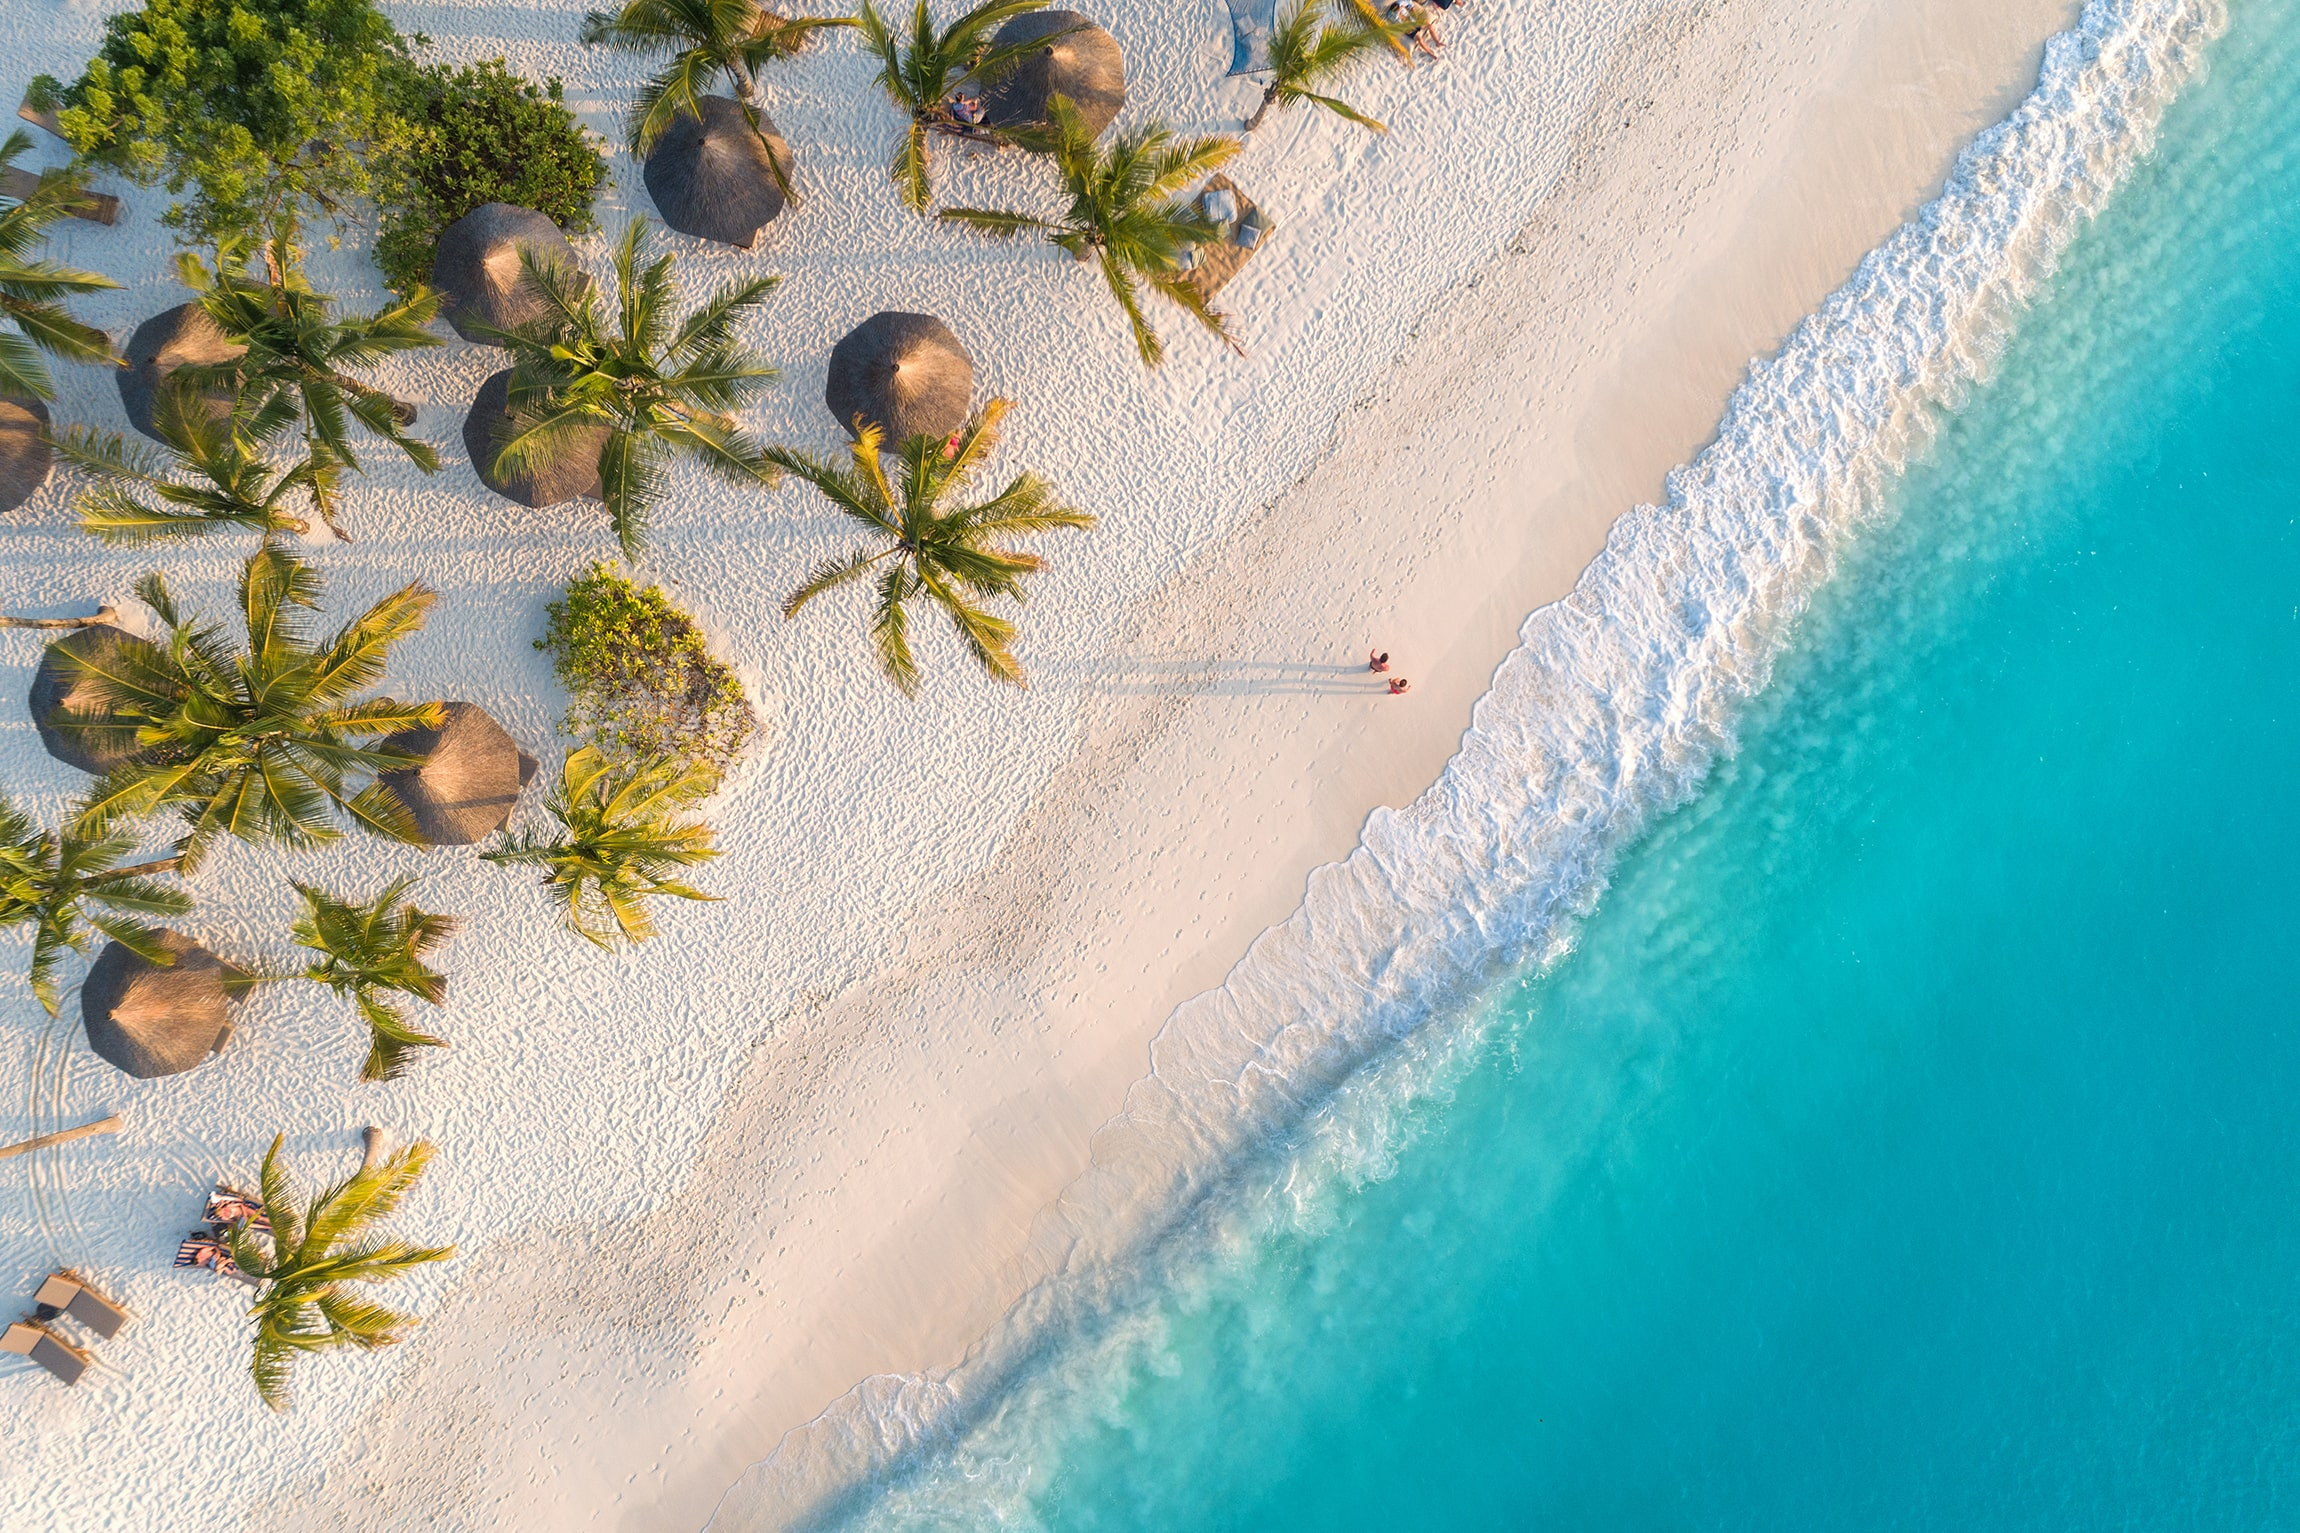 A serene beach as seen from overhead